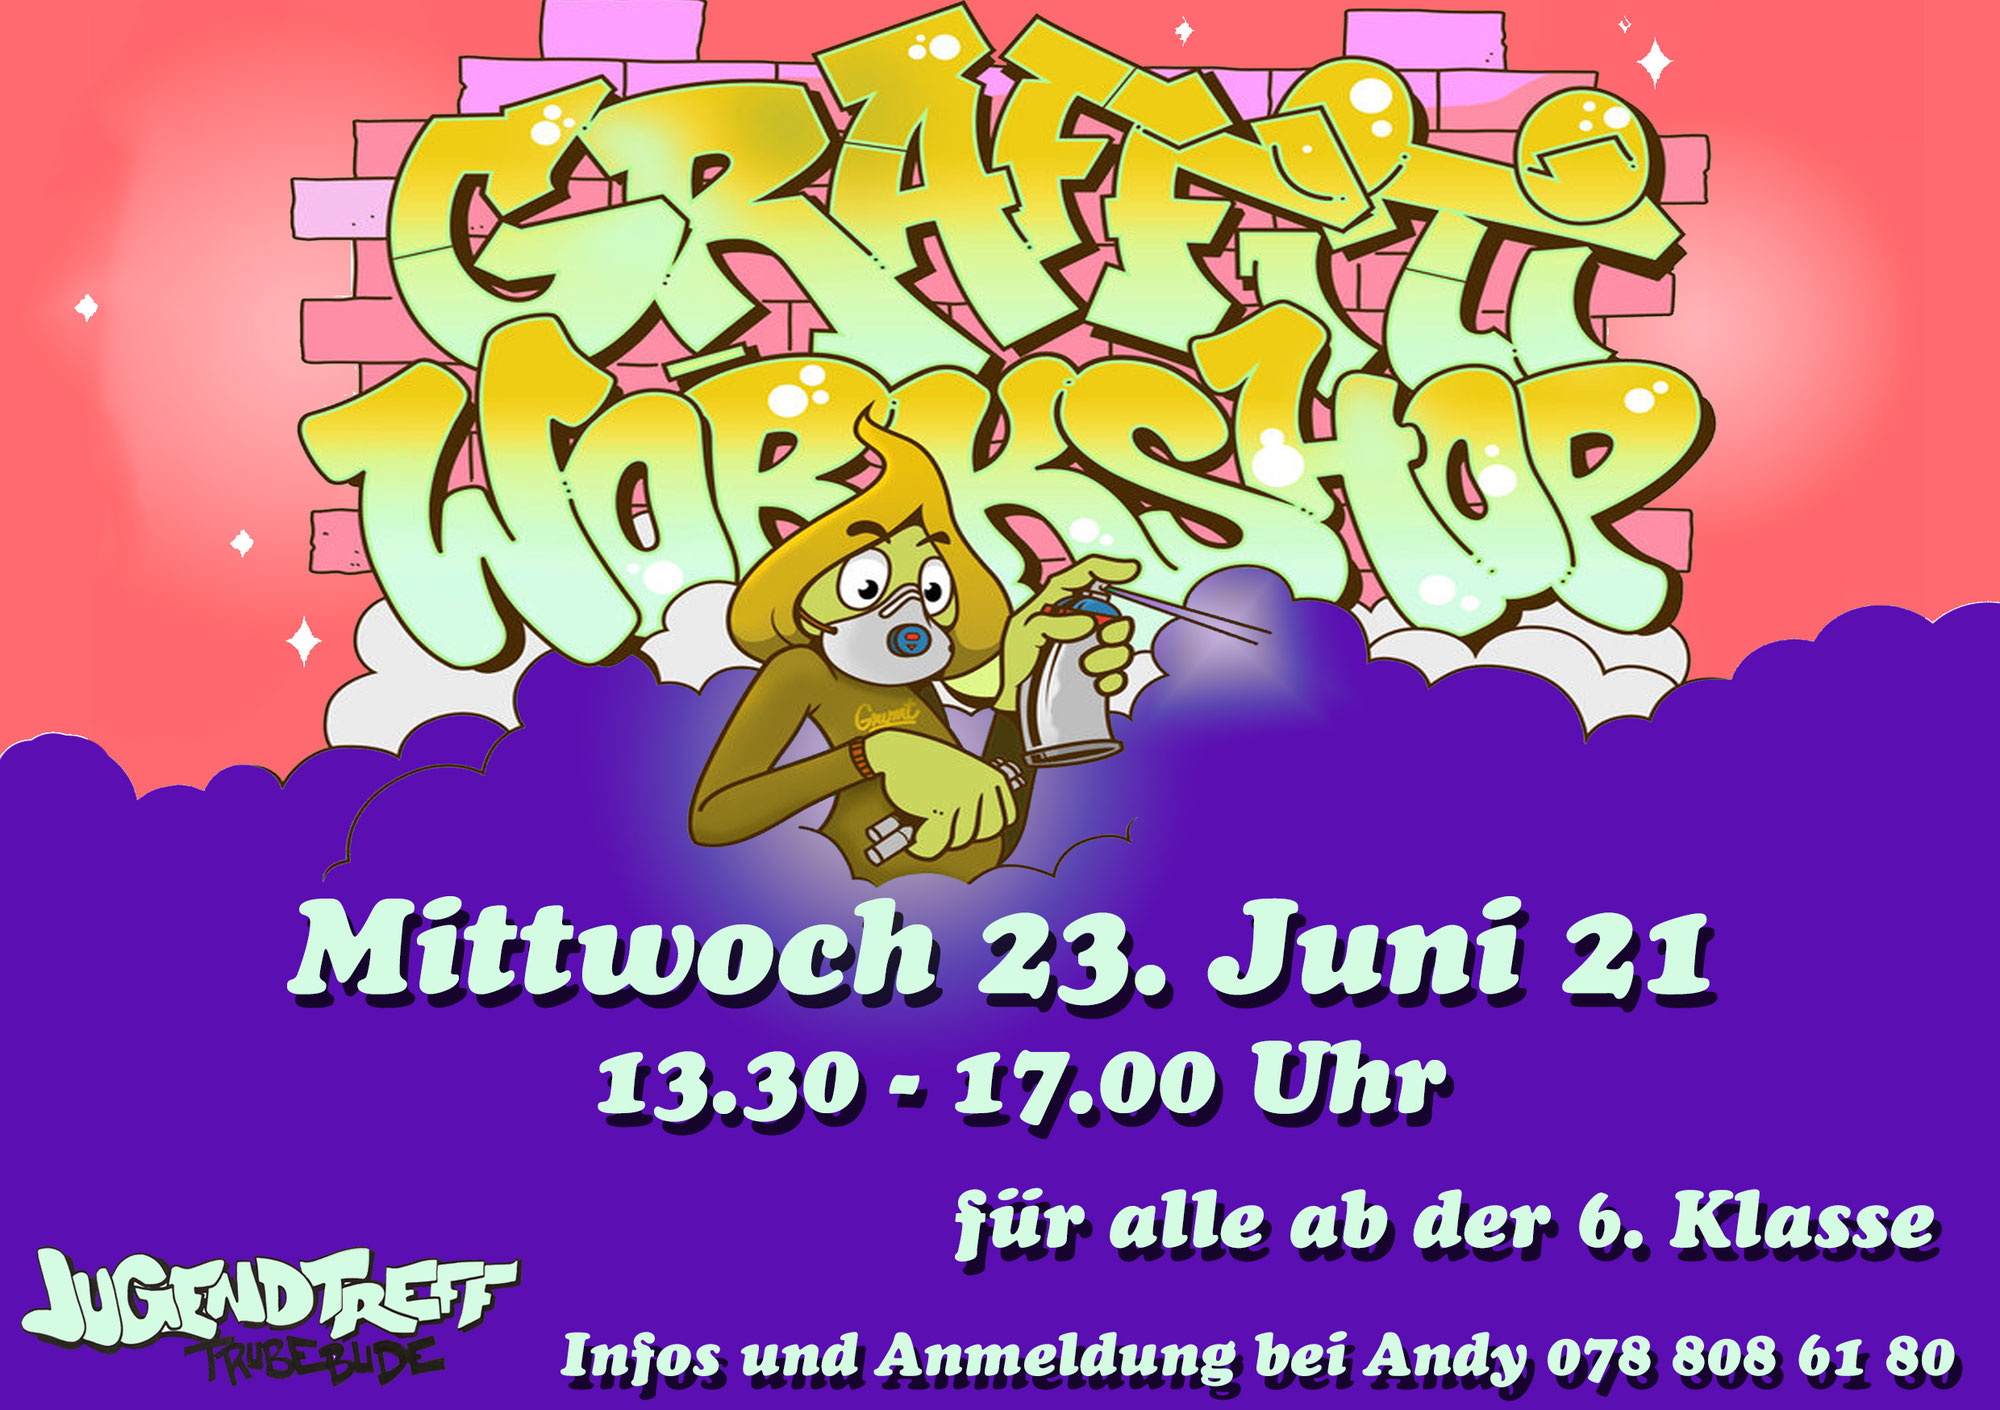 Graffitiworkshop mit Fabian am 23.6.